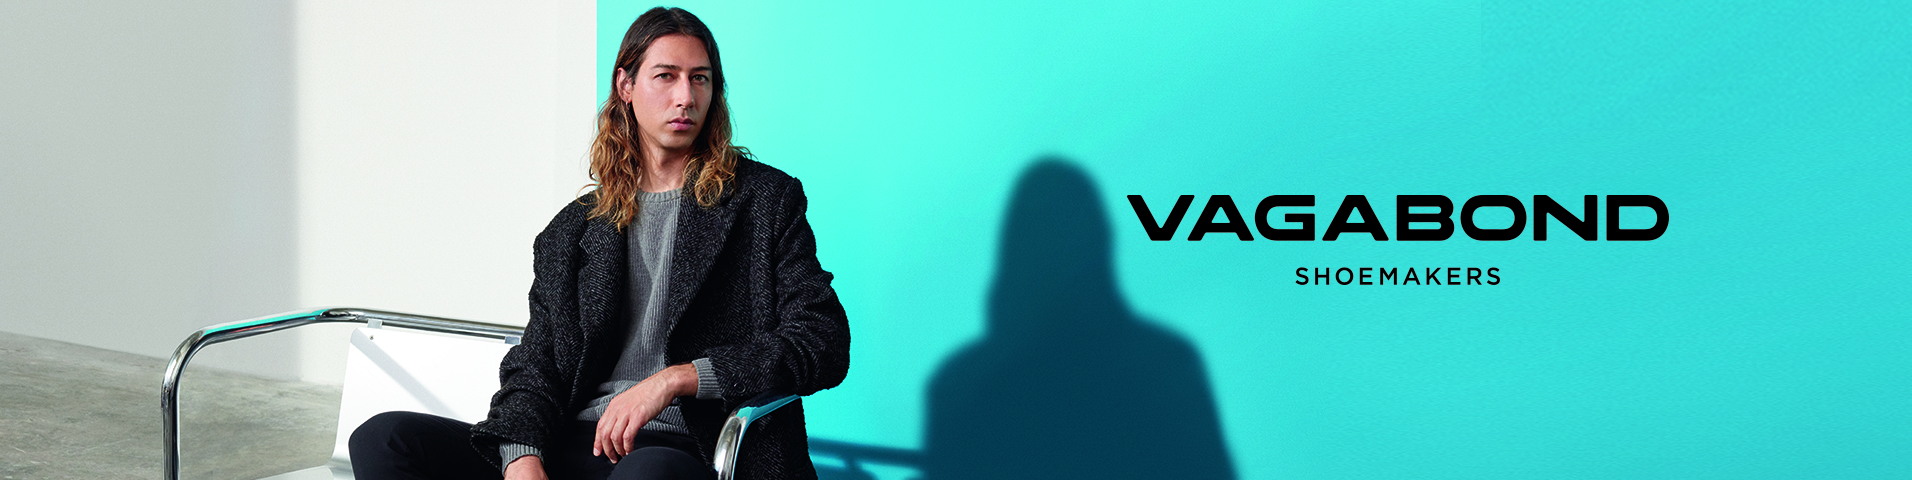 Vagabond Online Shop   Vagabond online bestellen bei Zalando 4237a7ec7d